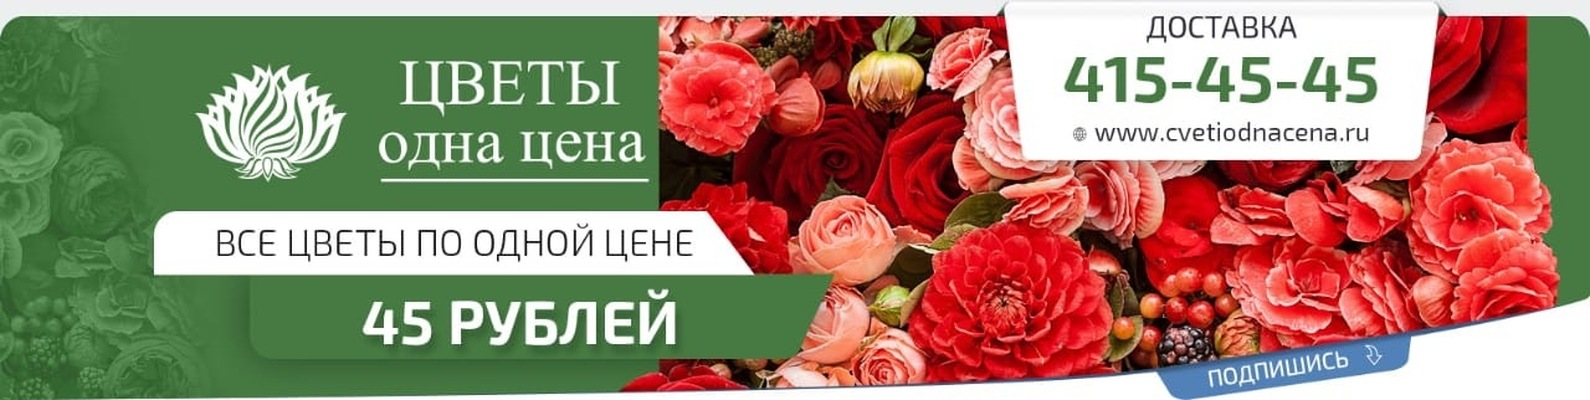 salon-tsvetov-buket-dzerzhinsk-adres-kakie-tsveti-podarit-za-docheri-na-den-rozhdeniya